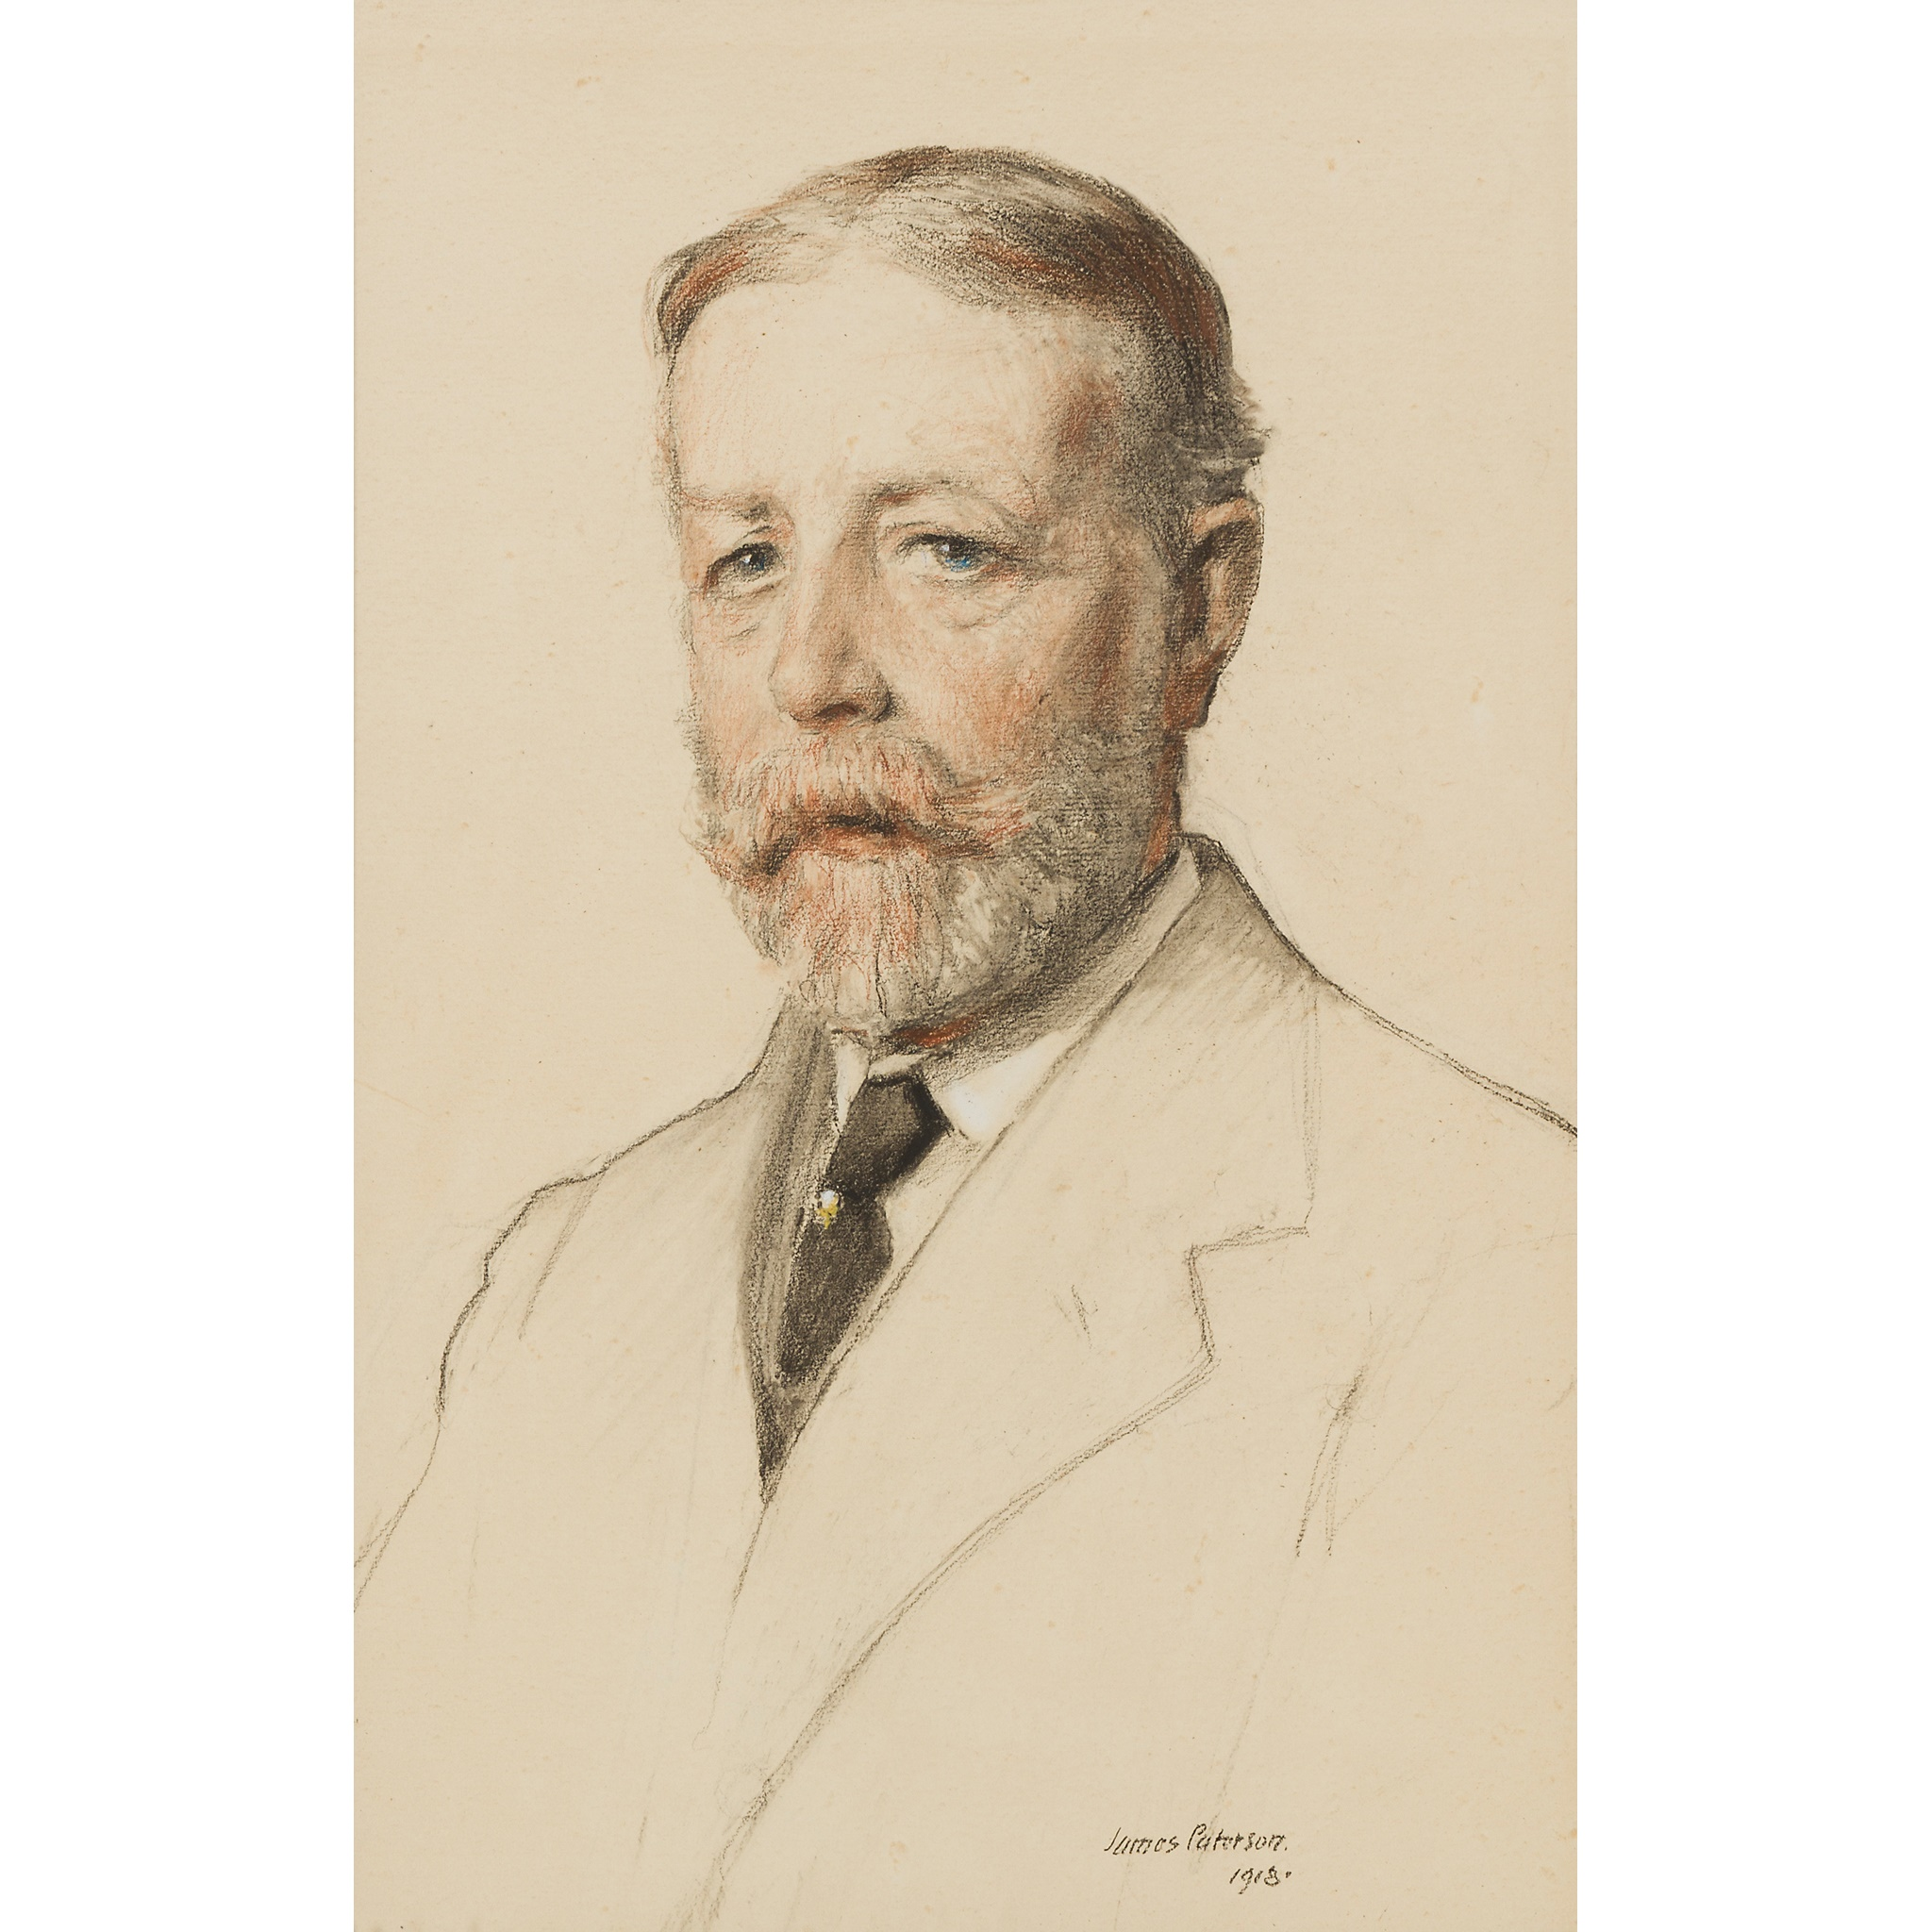 JAMES PATERSON R.S.W., R.S.A., R.W.S. (SCOTTISH 1854-1932) PORTRAIT OF J.COOK- 18 INDIA STREET